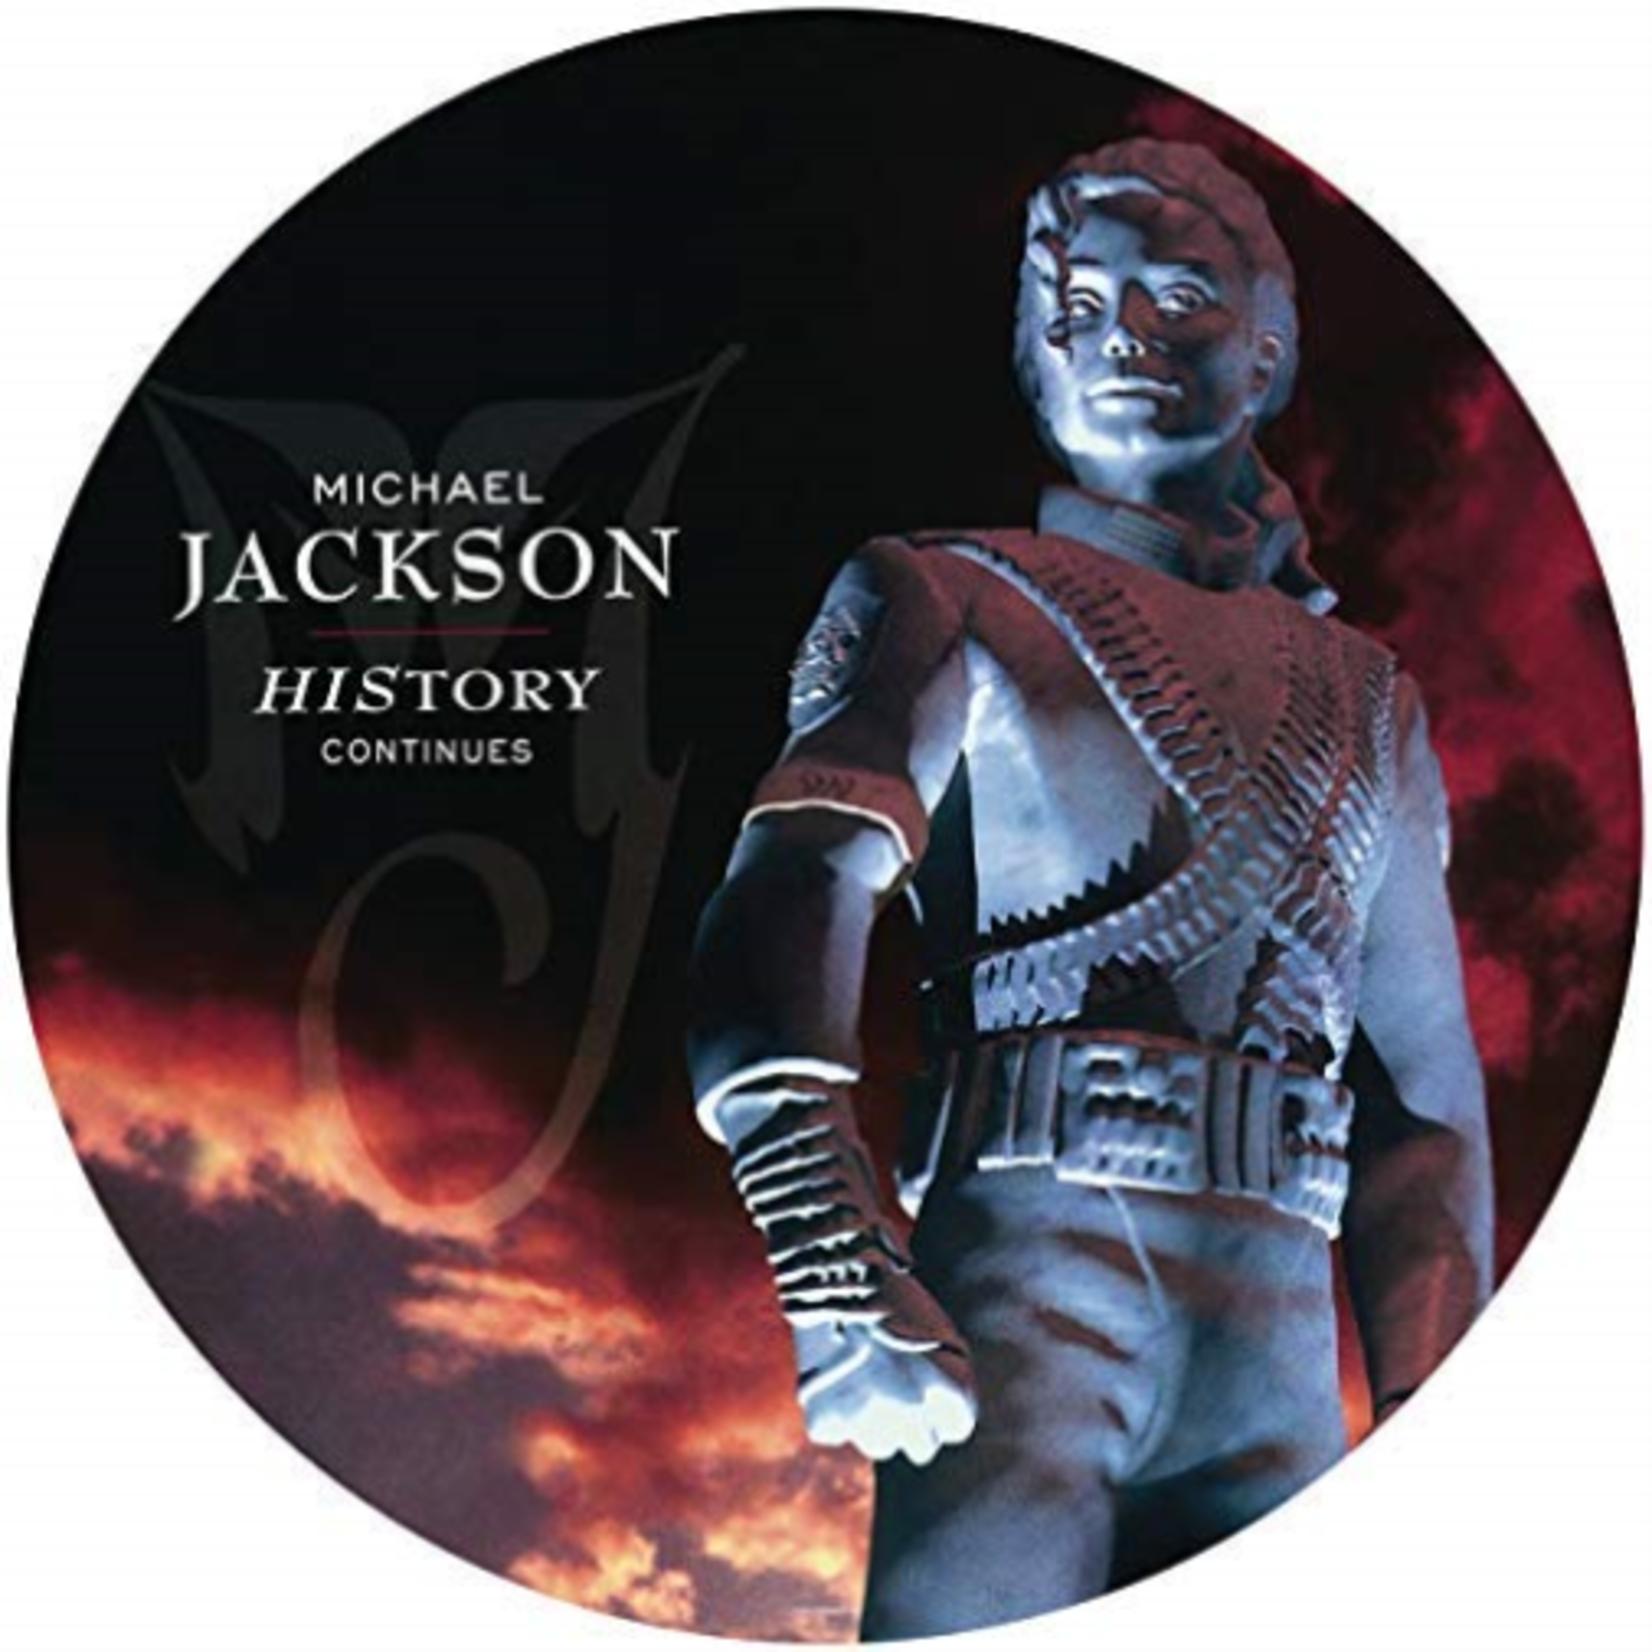 MICHAEL JACKSON HISTORY: CONTINUES (PICTURE VINYL)